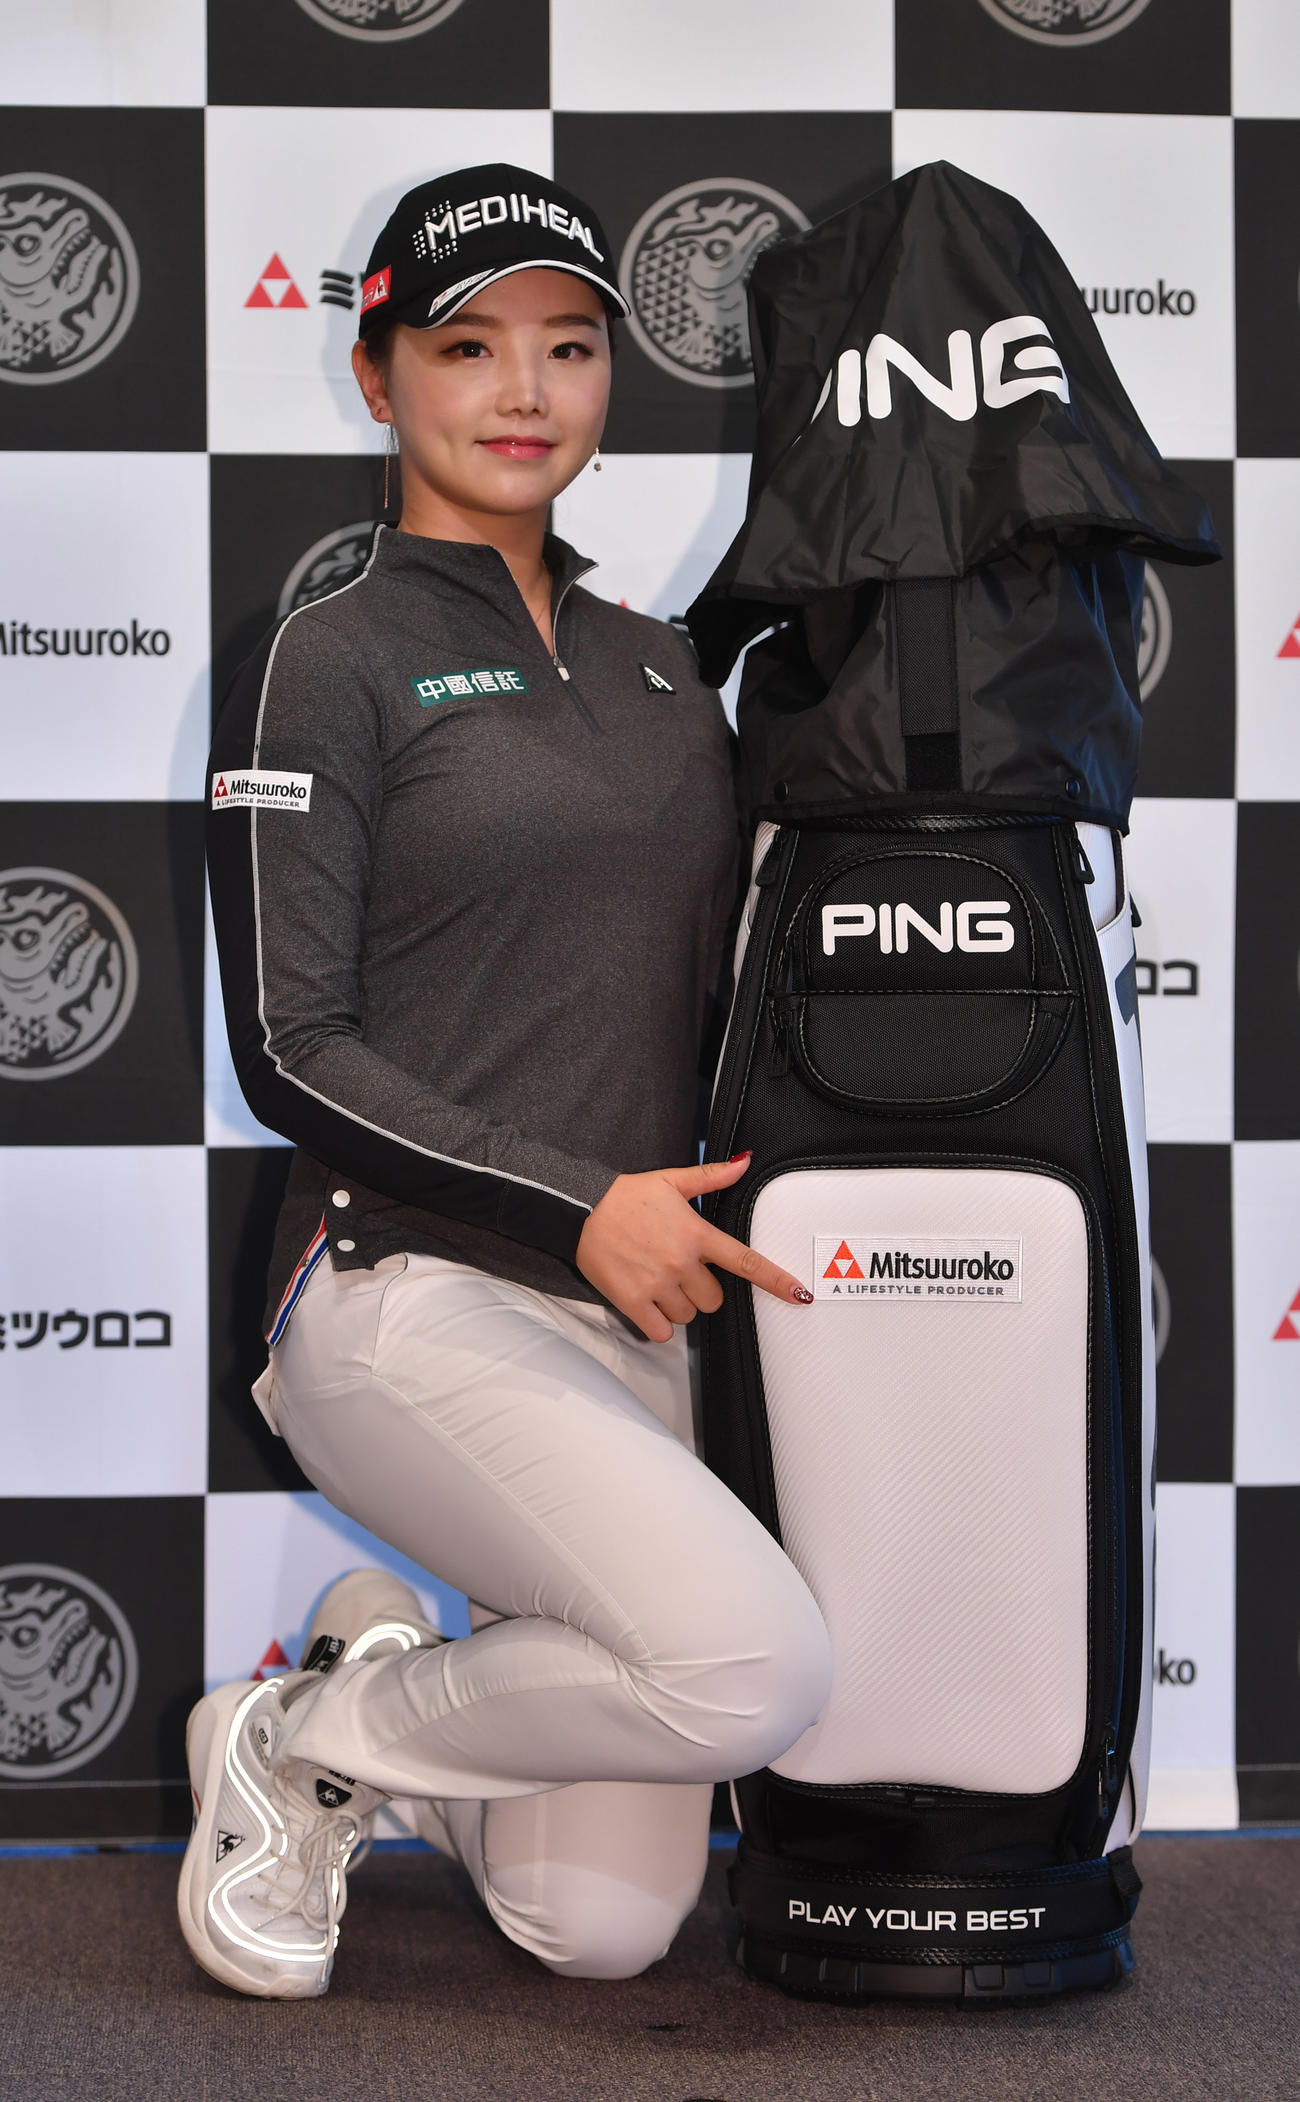 https://www.nikkansports.com/sports/golf/news/img/202002180000438-w1300_1.jpg